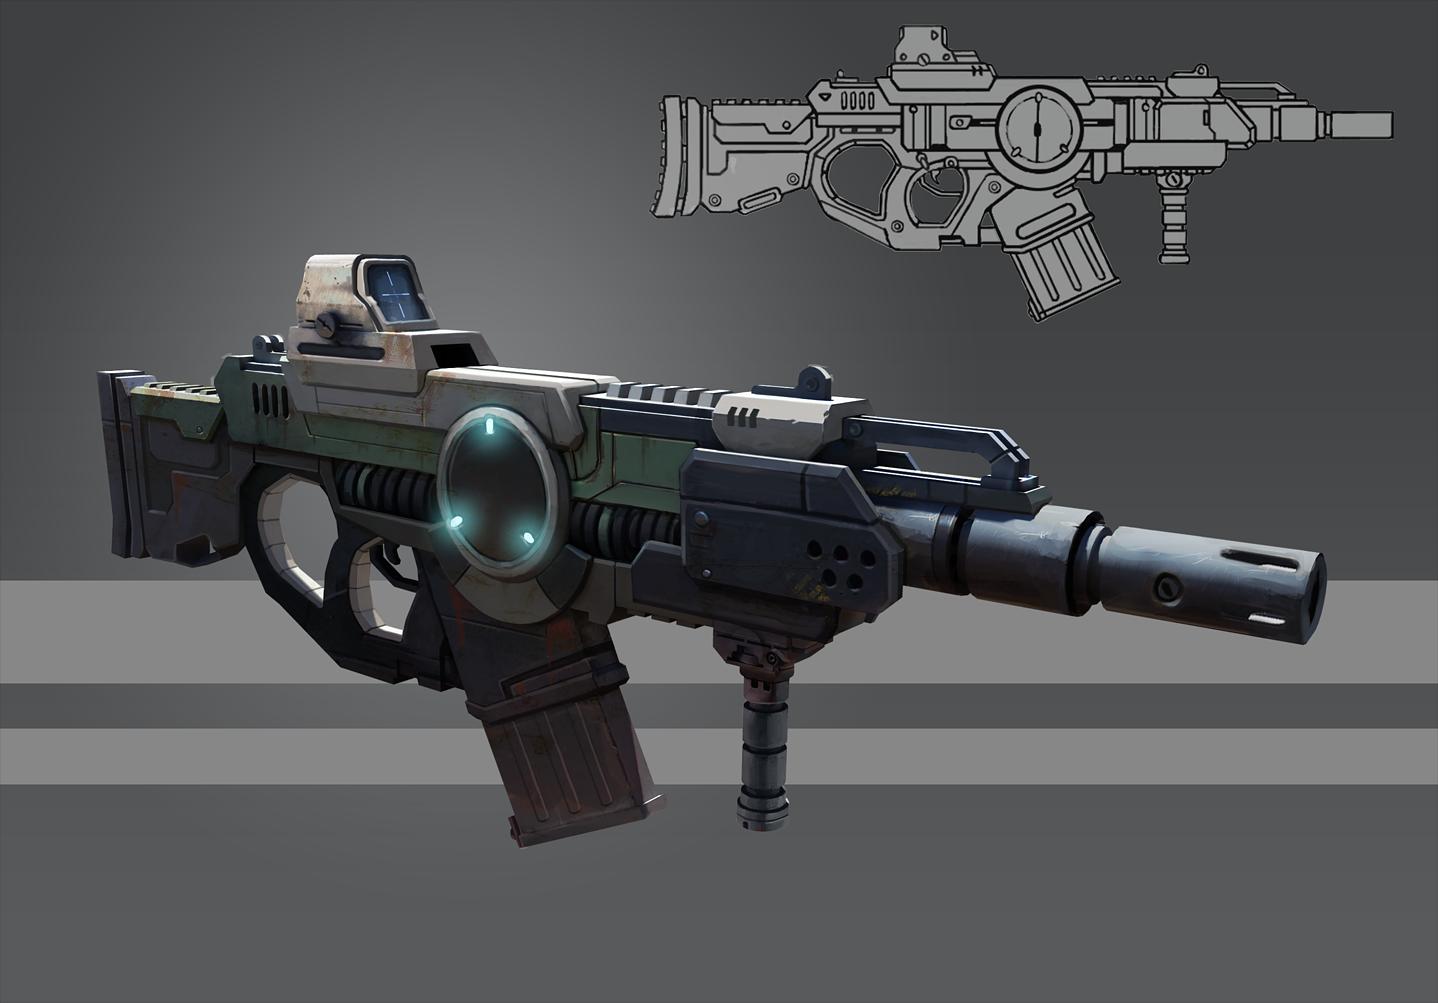 Futuristic Rifle - Concept by gabrielegabba on DeviantArt